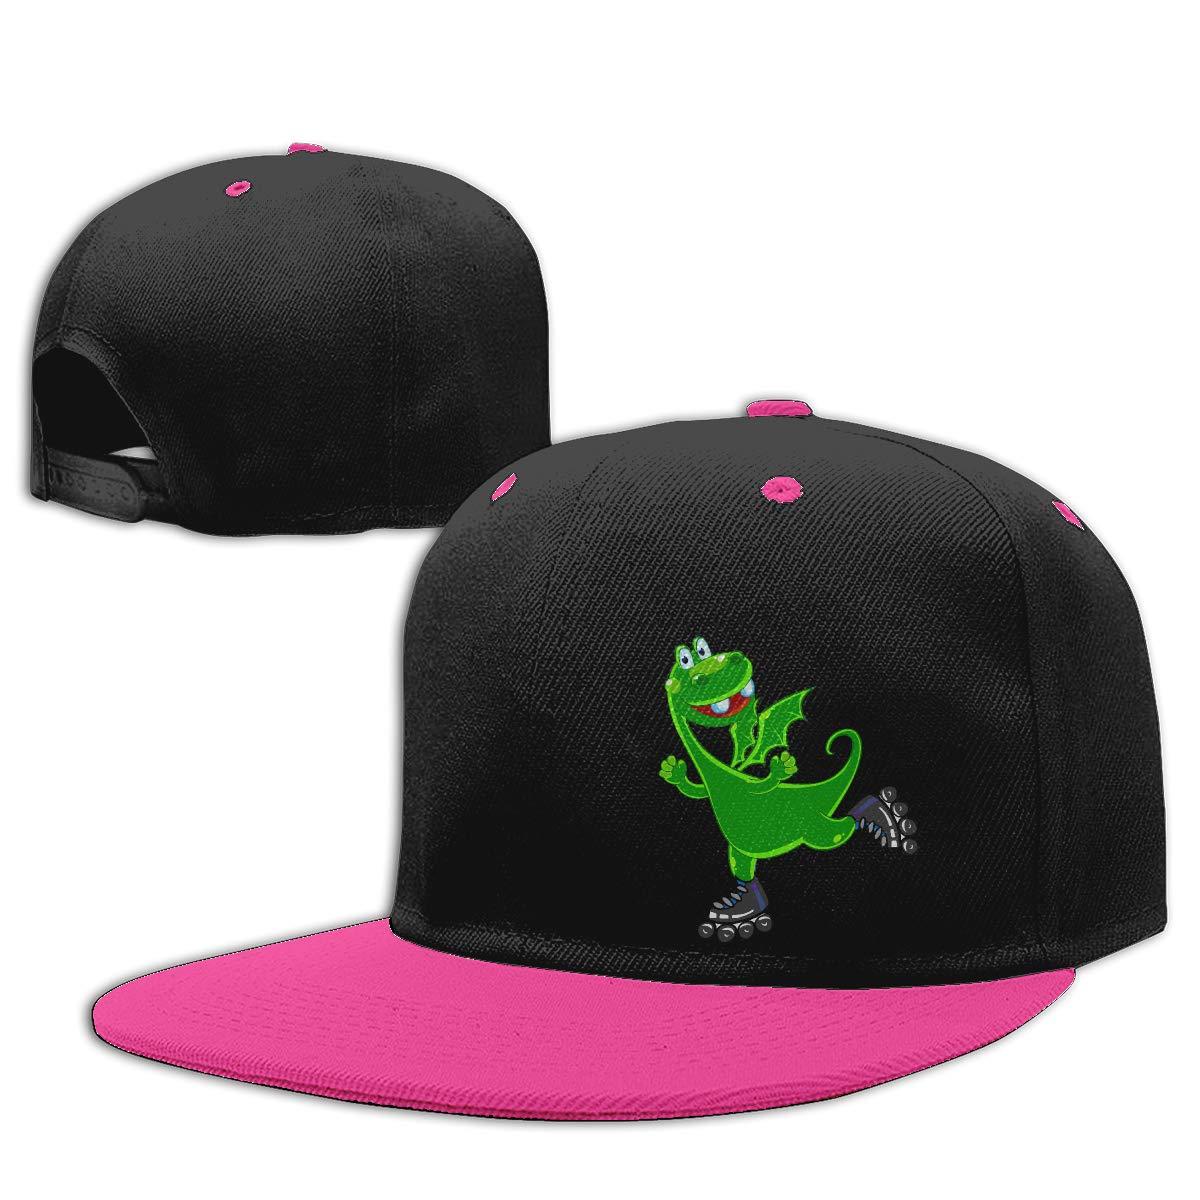 Men Womens Punk Rock Cap Dinosaur Riding Roller Skates Fashion Flat Brim Baseball Caps